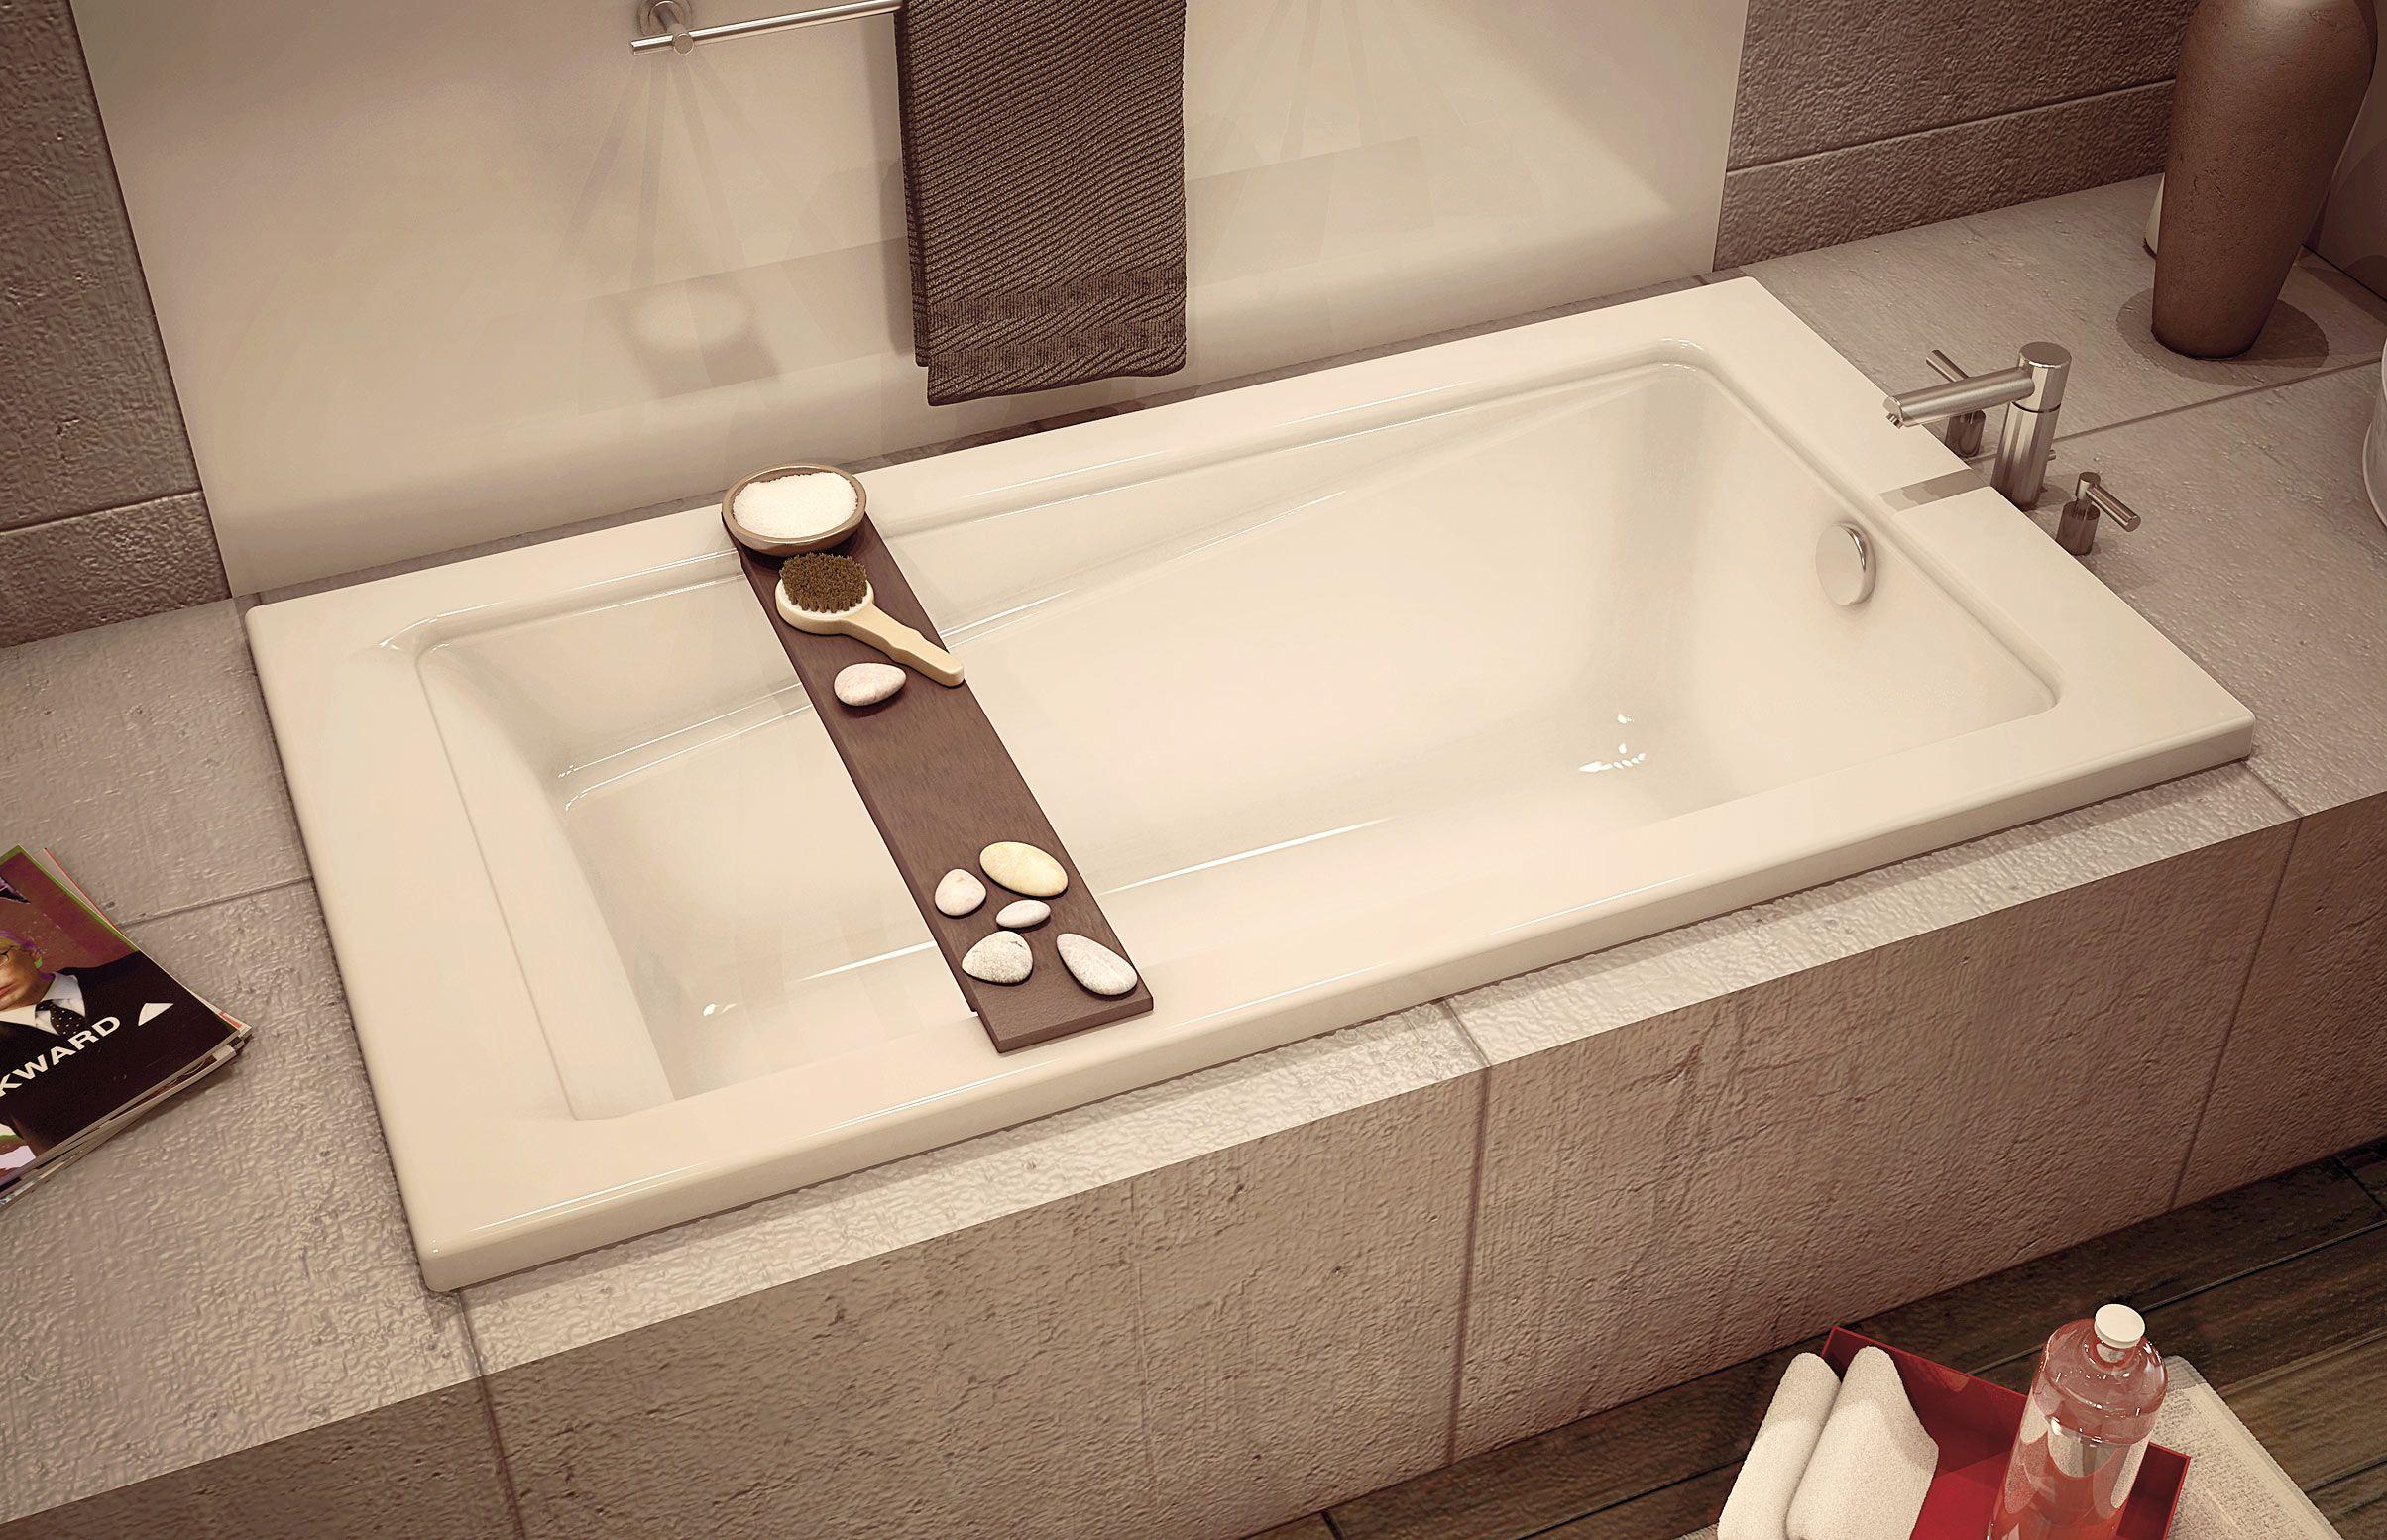 New Town 6032 Alcove or Drop in bathtub   Advanta by MAAXNew Town 6032 Alcove or Drop in bathtub   Advanta by MAAX  . Maax Avenue Bathtub Installation Instructions. Home Design Ideas